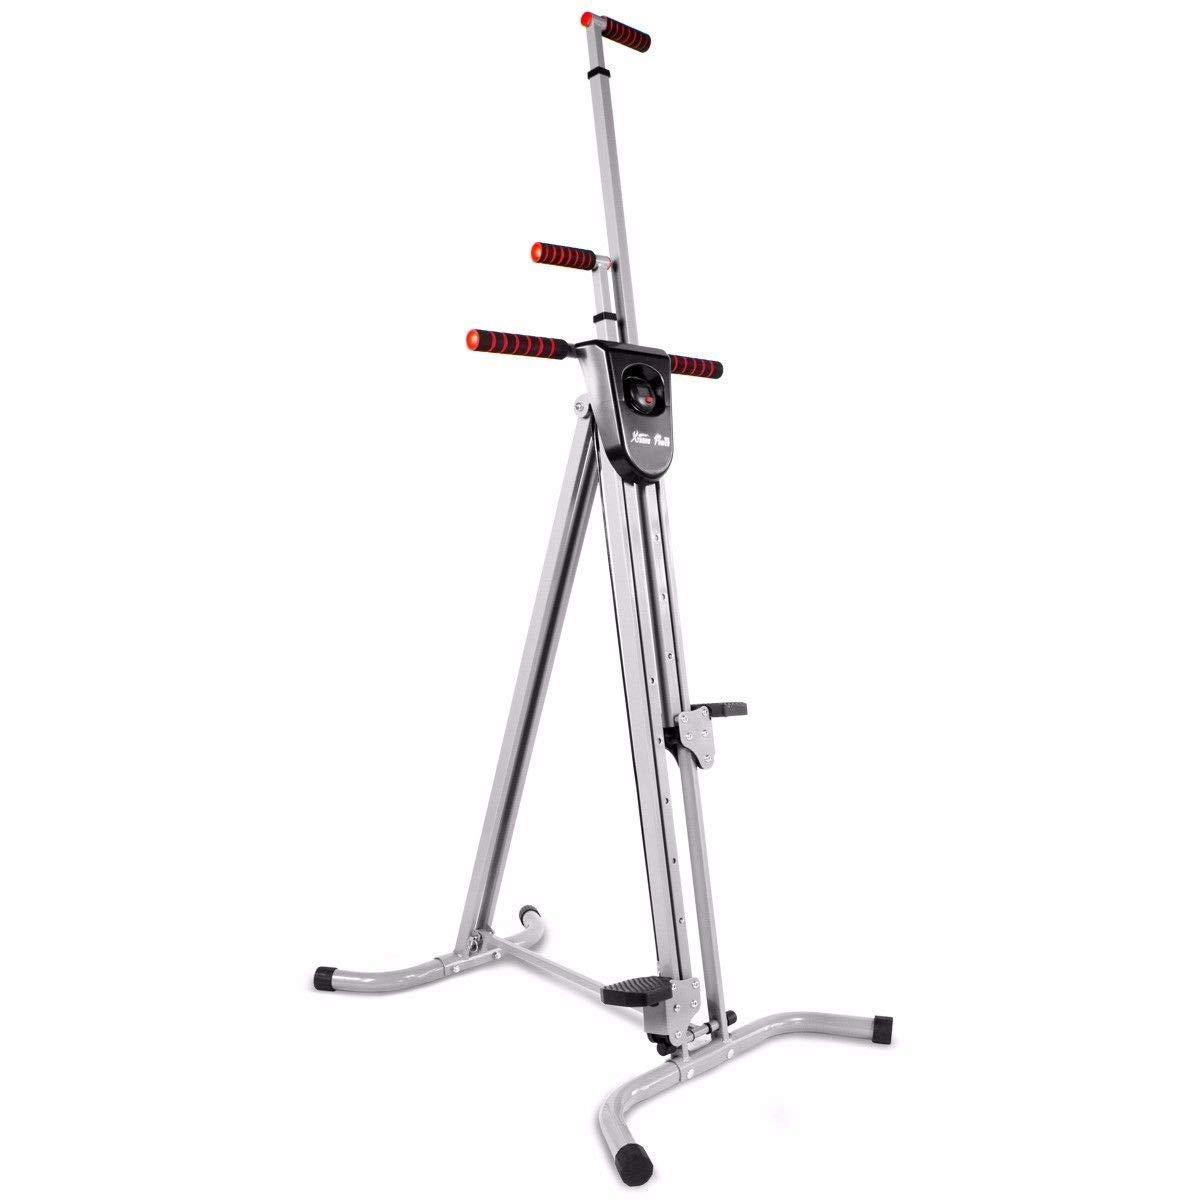 XtremepowerUS Vertical Climber Fitness Cardio Exercise Machine by XtremepowerUS (Image #2)